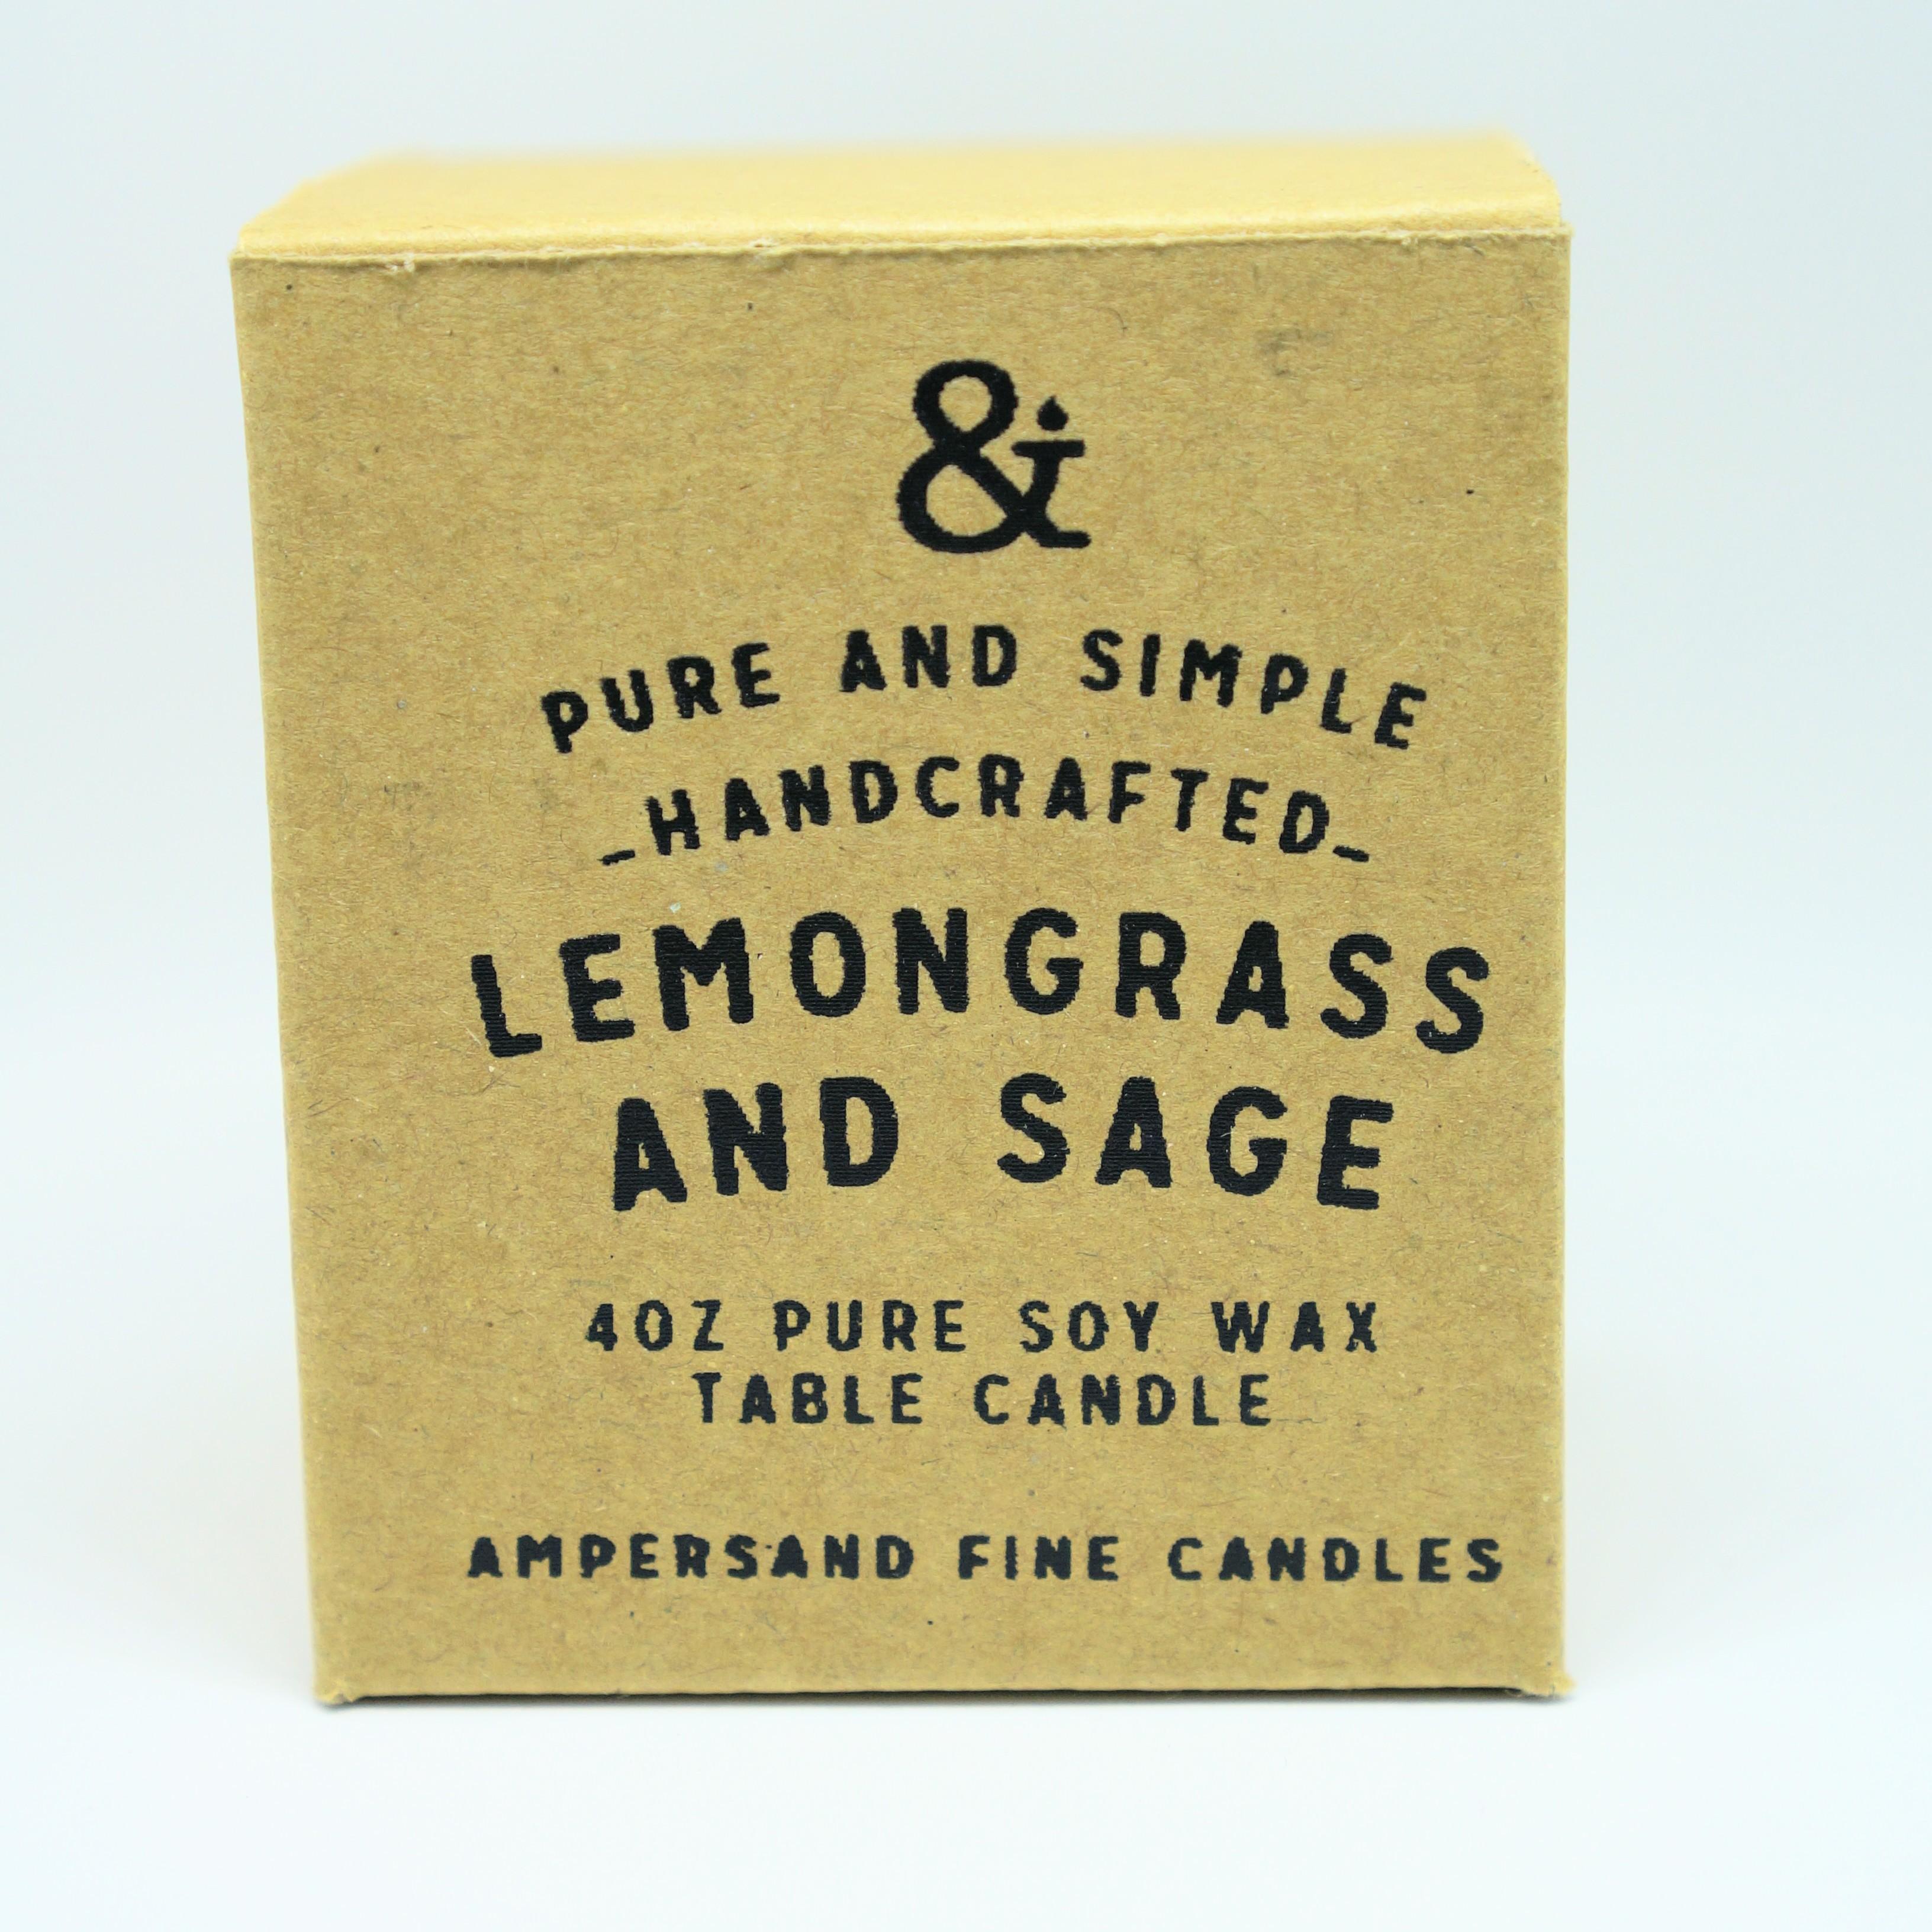 4oz Amber Jar Candle -LEMONGRASS AND SAGE- キャンドル Candles - 画像1